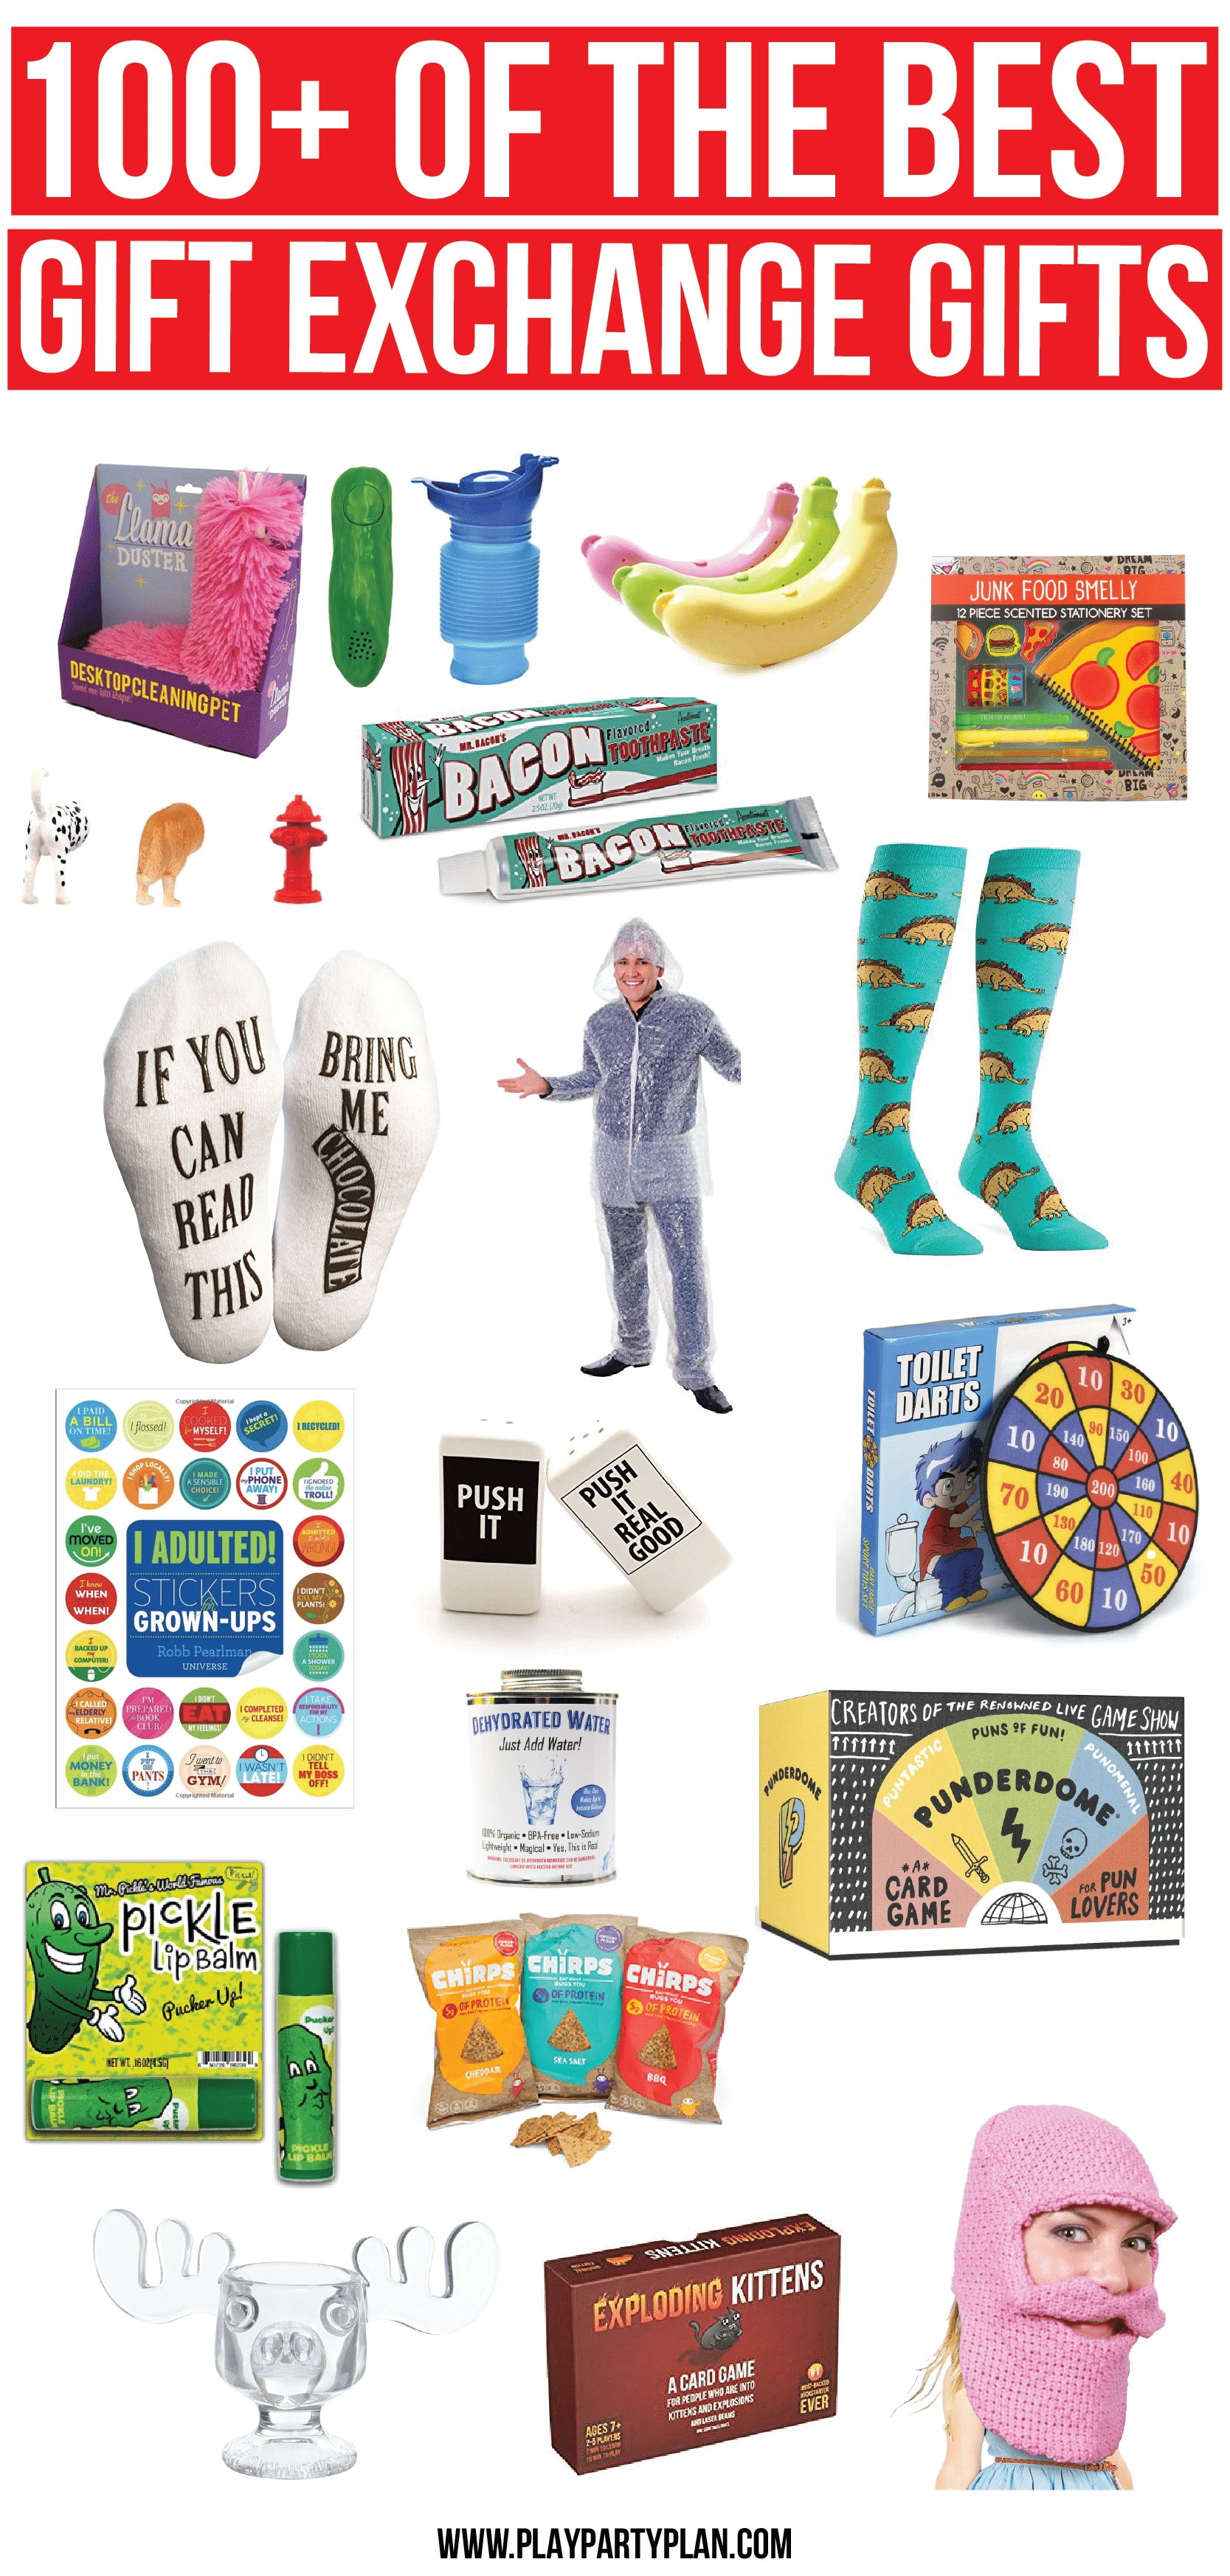 10 Famous Hilarious White Elephant Gift Ideas 100 of the best white elephant gifts other gift ideas play 12 2021